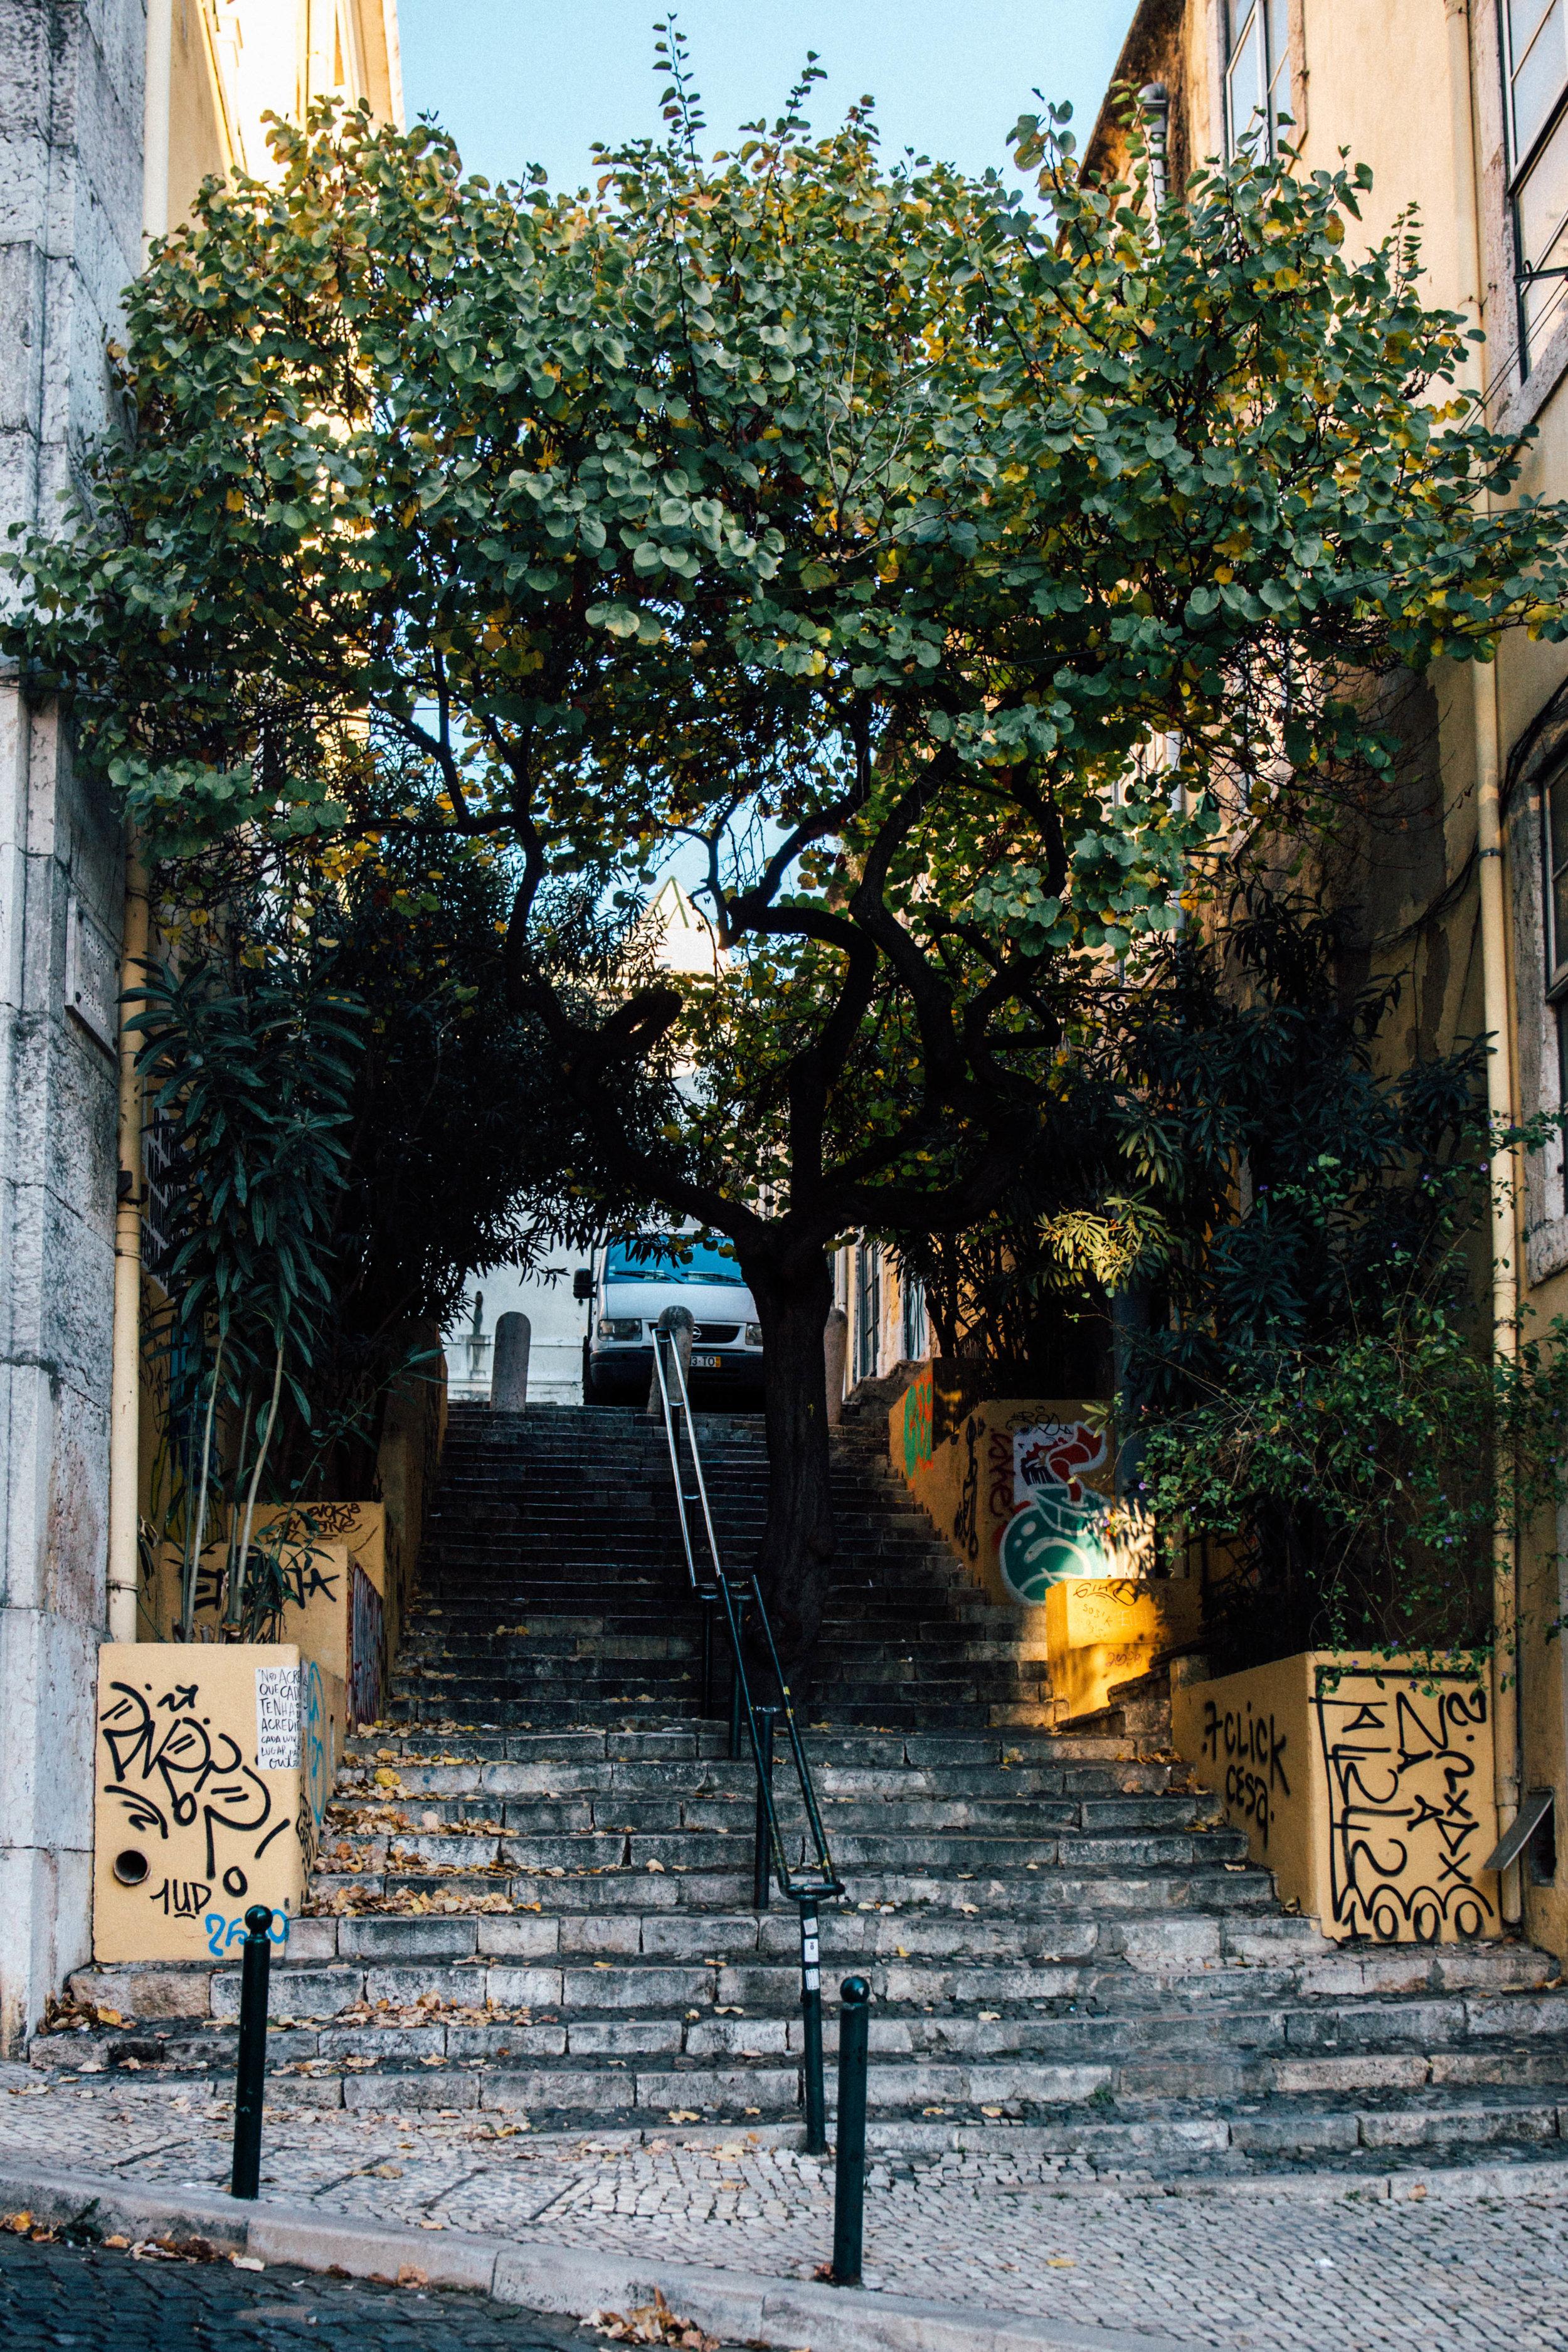 Lisboa by Jorge Güiro 60.jpg